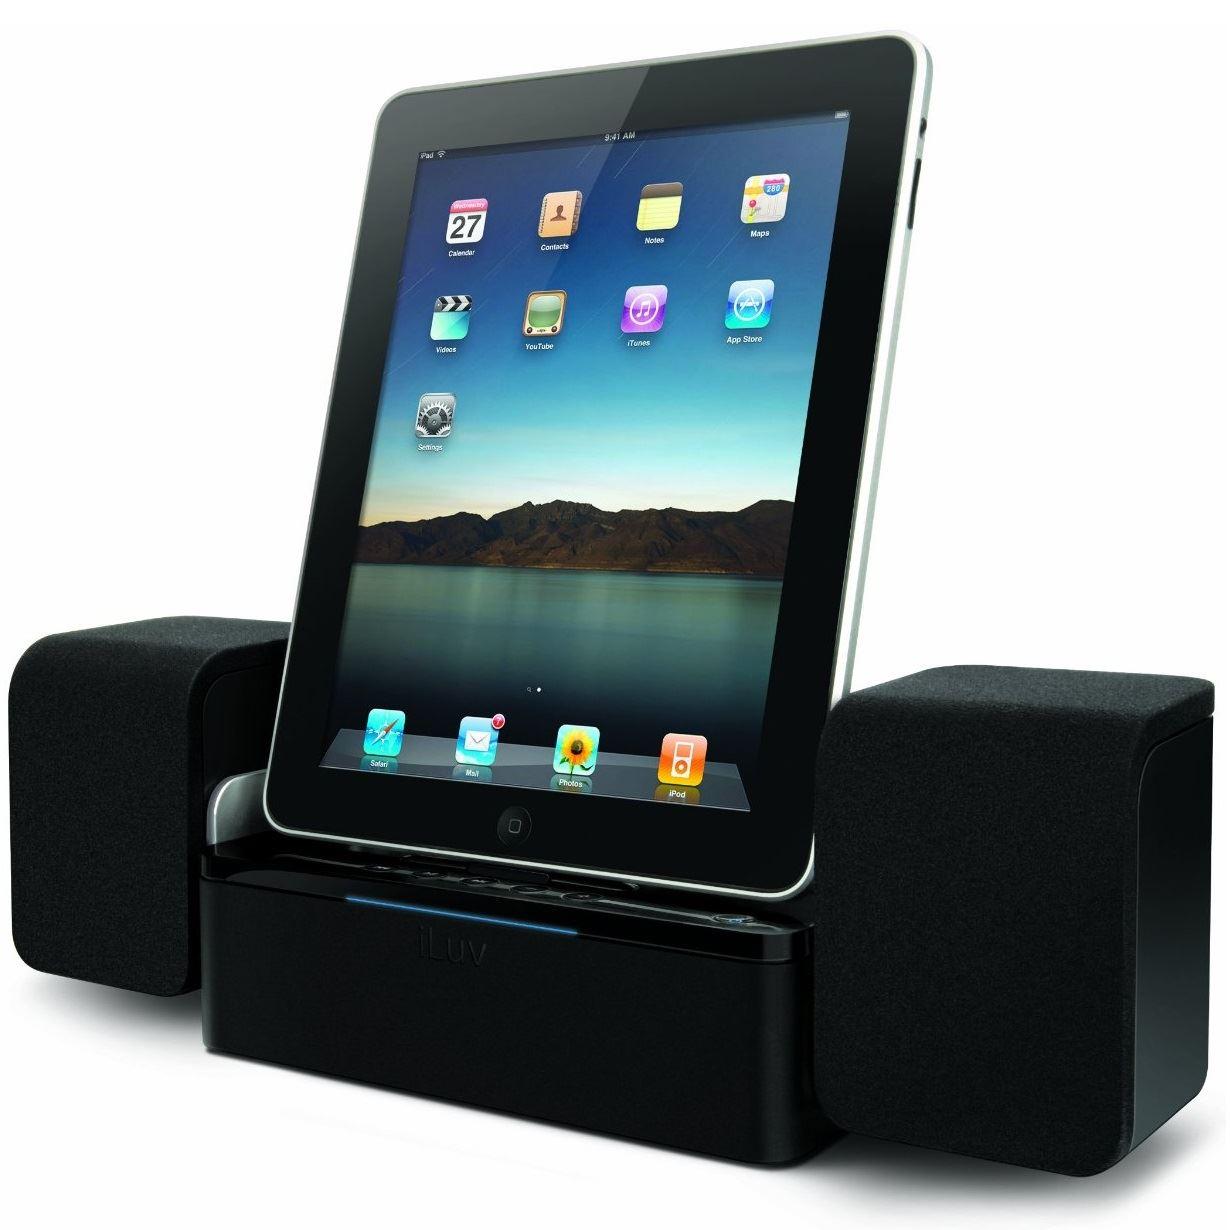 iluv imm747 audio cube docking station speaker system charging iphone ipod ipad. Black Bedroom Furniture Sets. Home Design Ideas